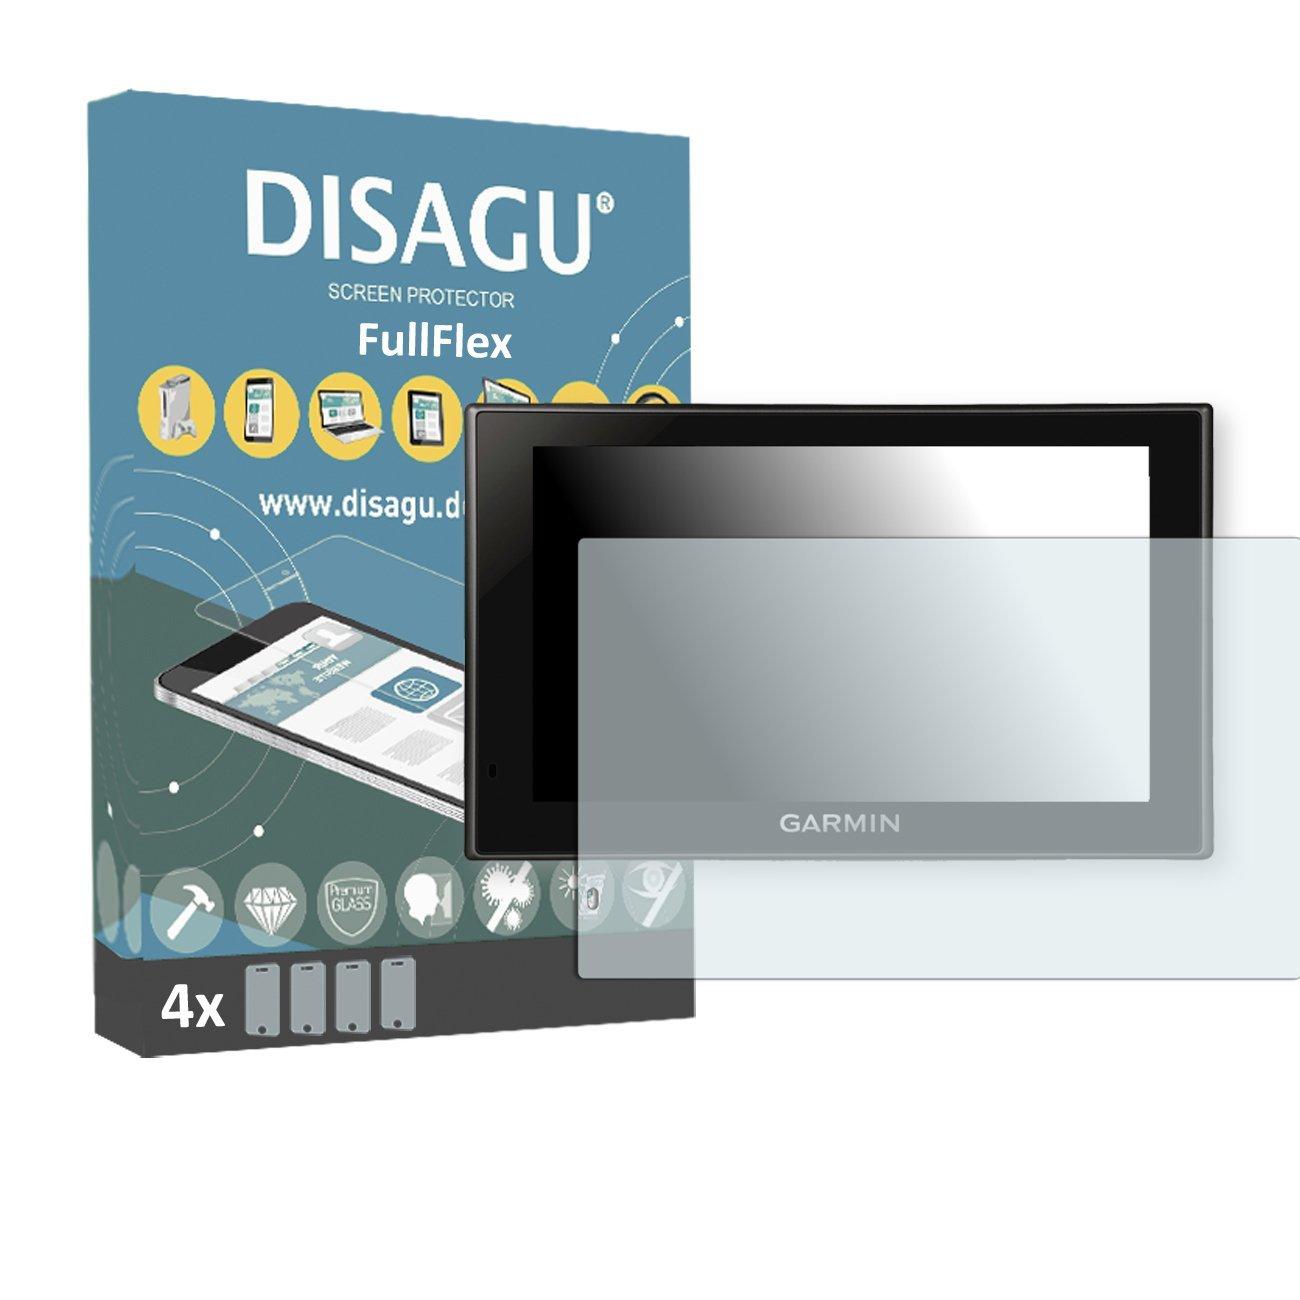 4 x Disagu FullFlex screen protector for Garmin Camper 660 LMT foil screen protector